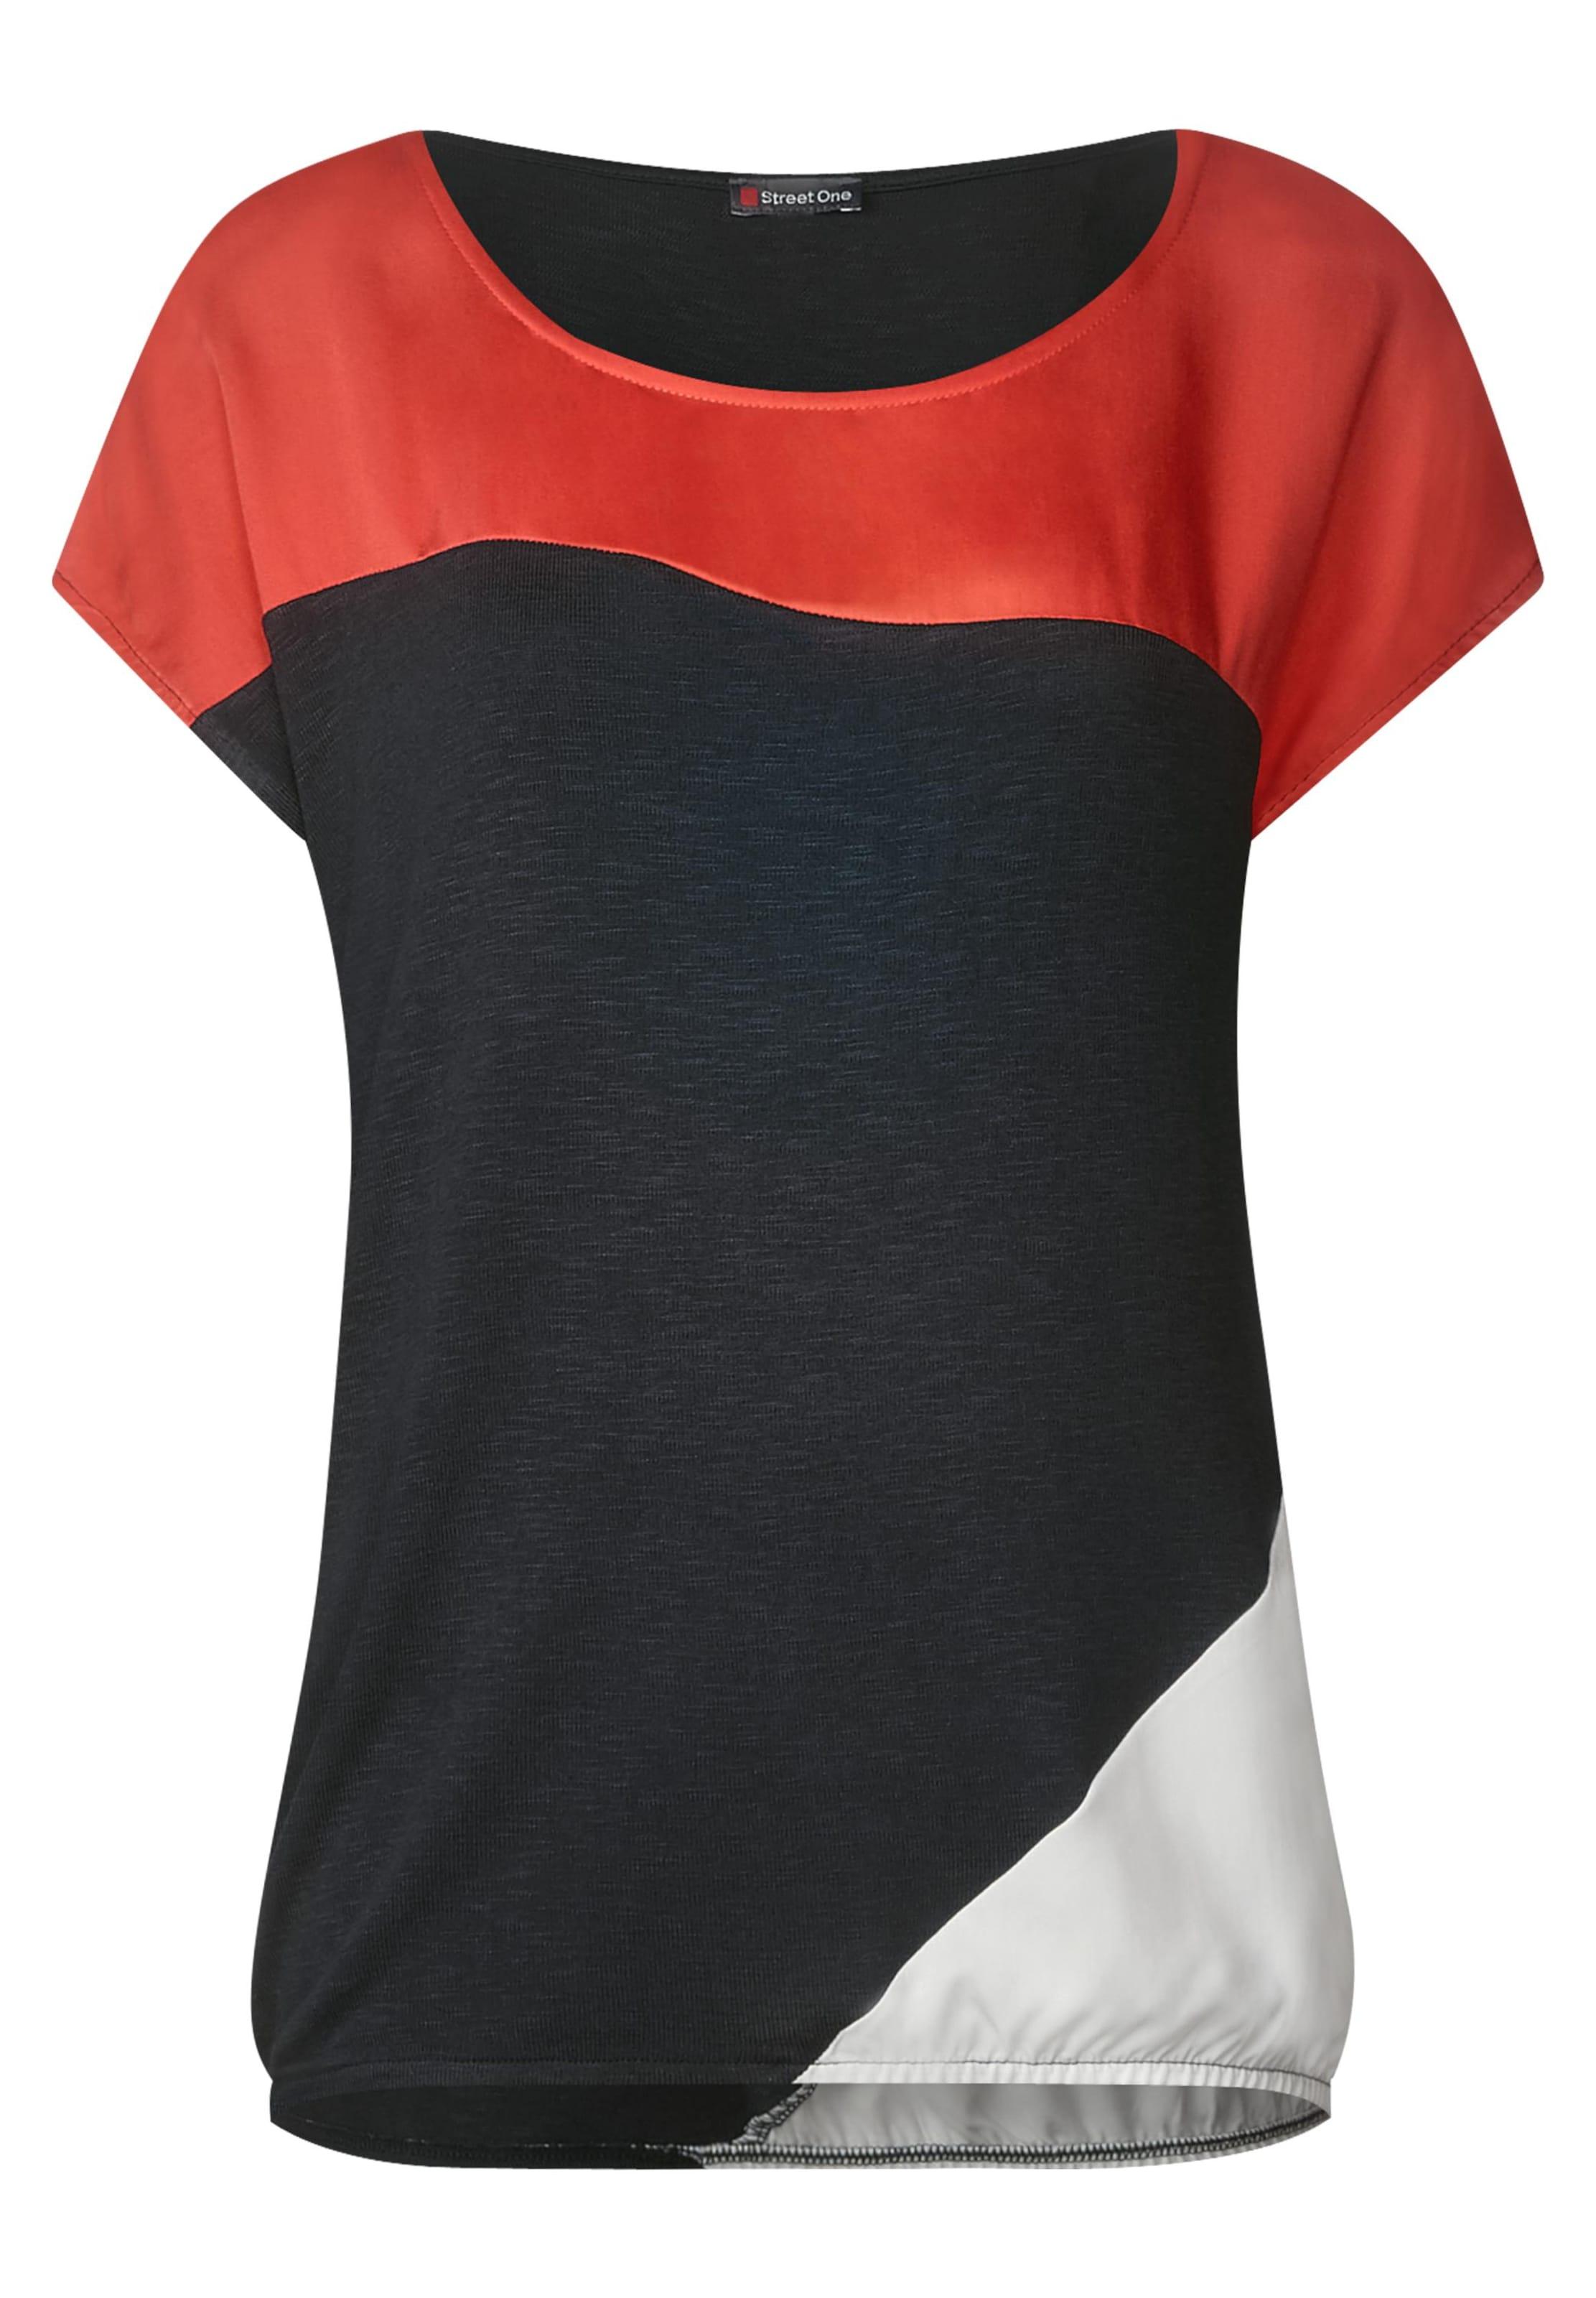 In Street 'vianna' One Shirt Weiß HellrotSchwarz cARjL3S5q4